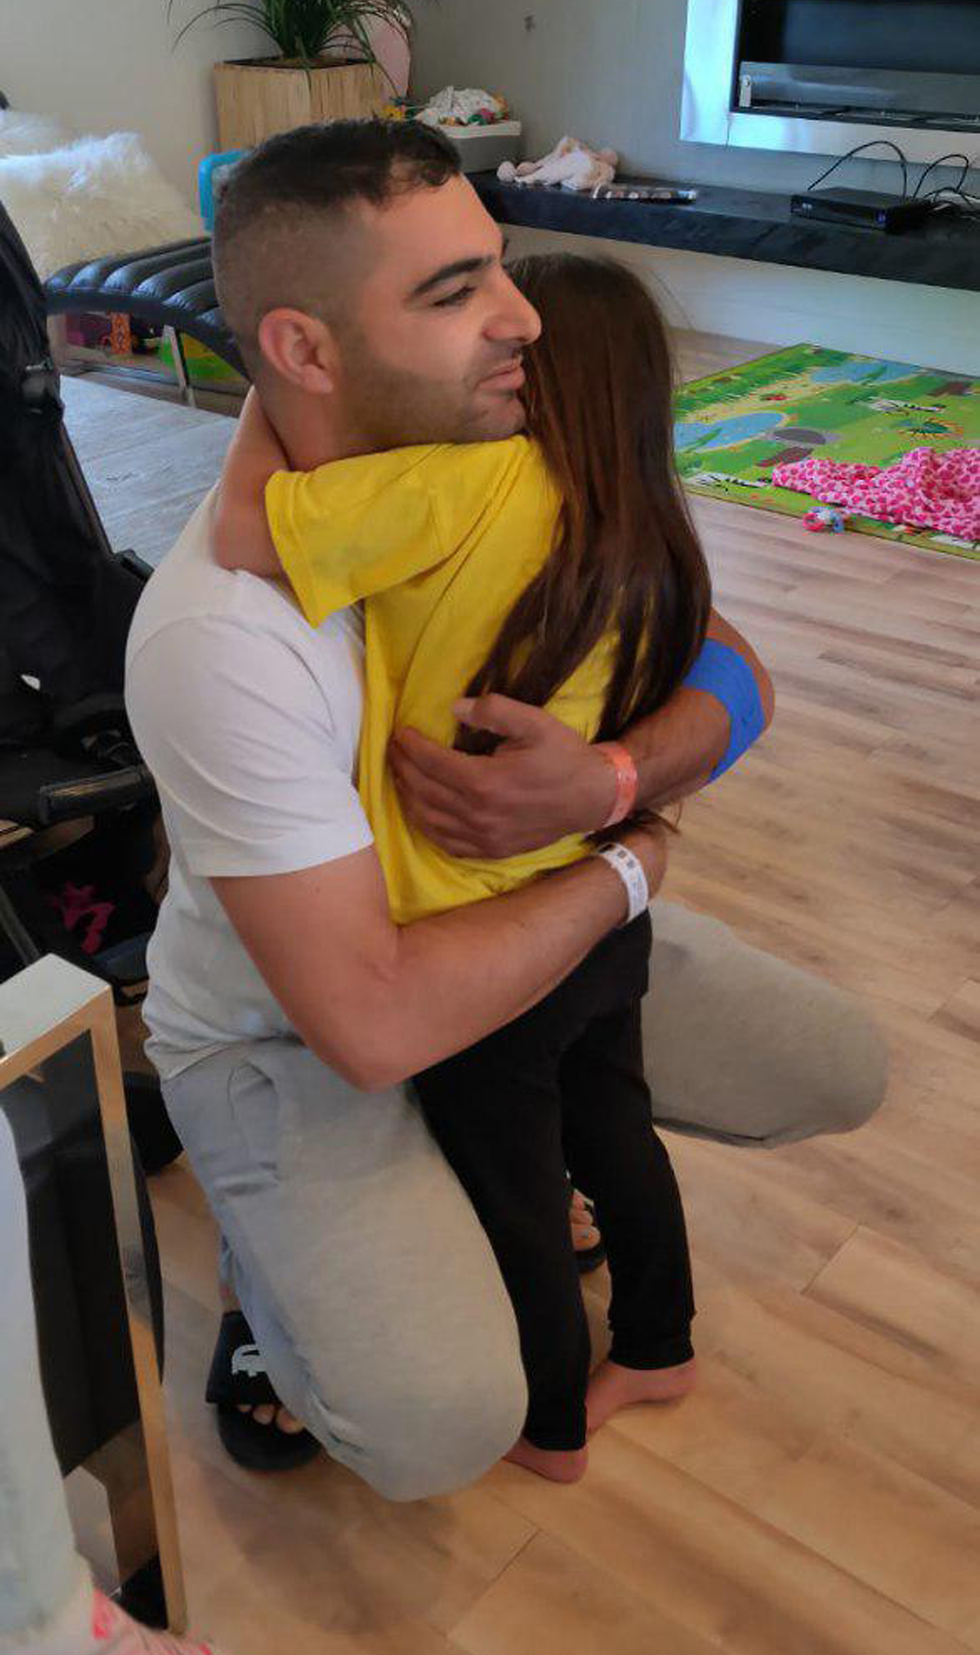 Noya Dahan and Almog Peretz (Photo: Tzipi Shmilovich)